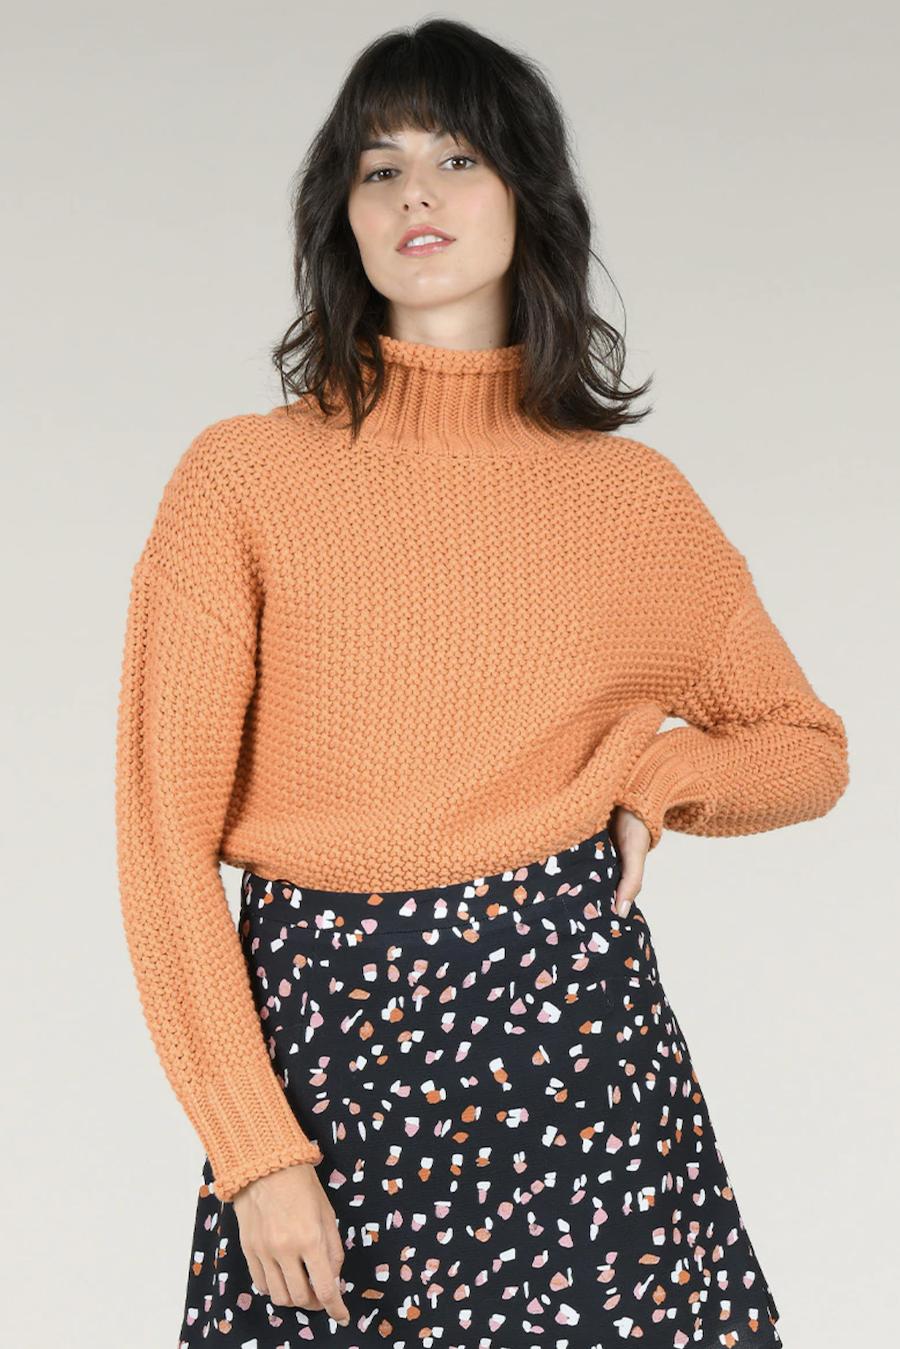 Jersey de mujer de manga larga con cuello alto